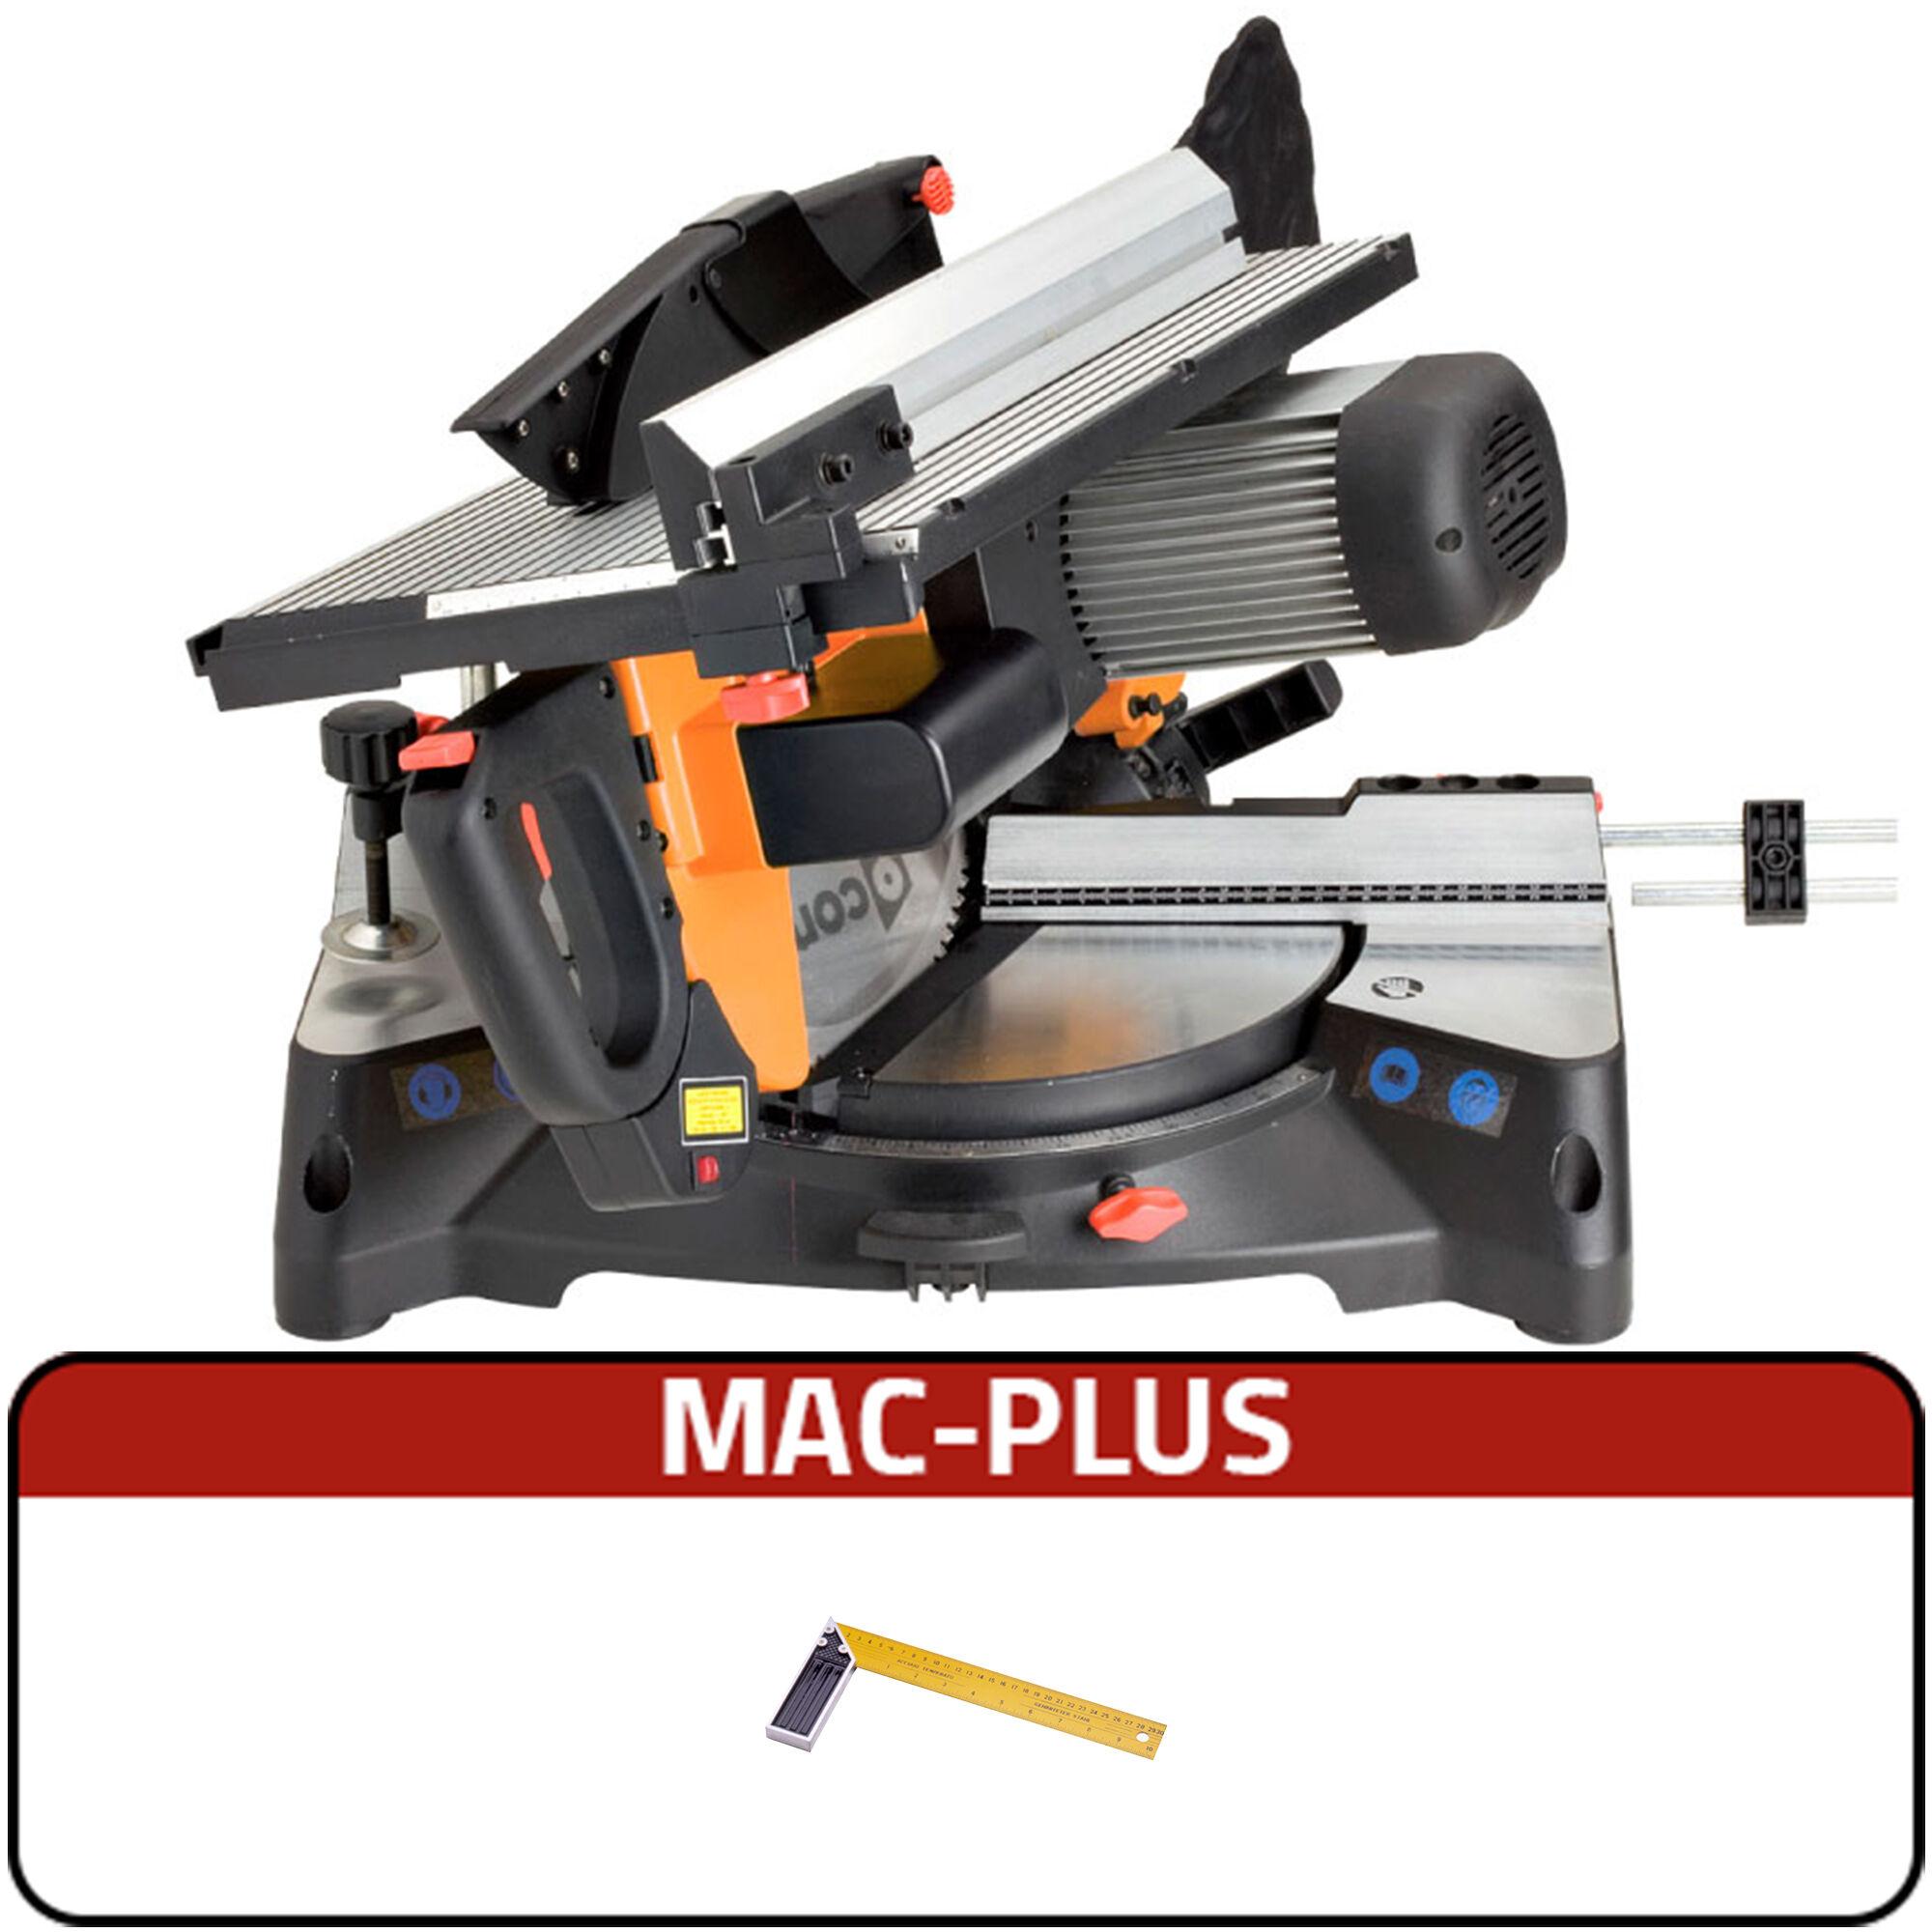 compa troncatrice compa orange 305-90 + mac - plus